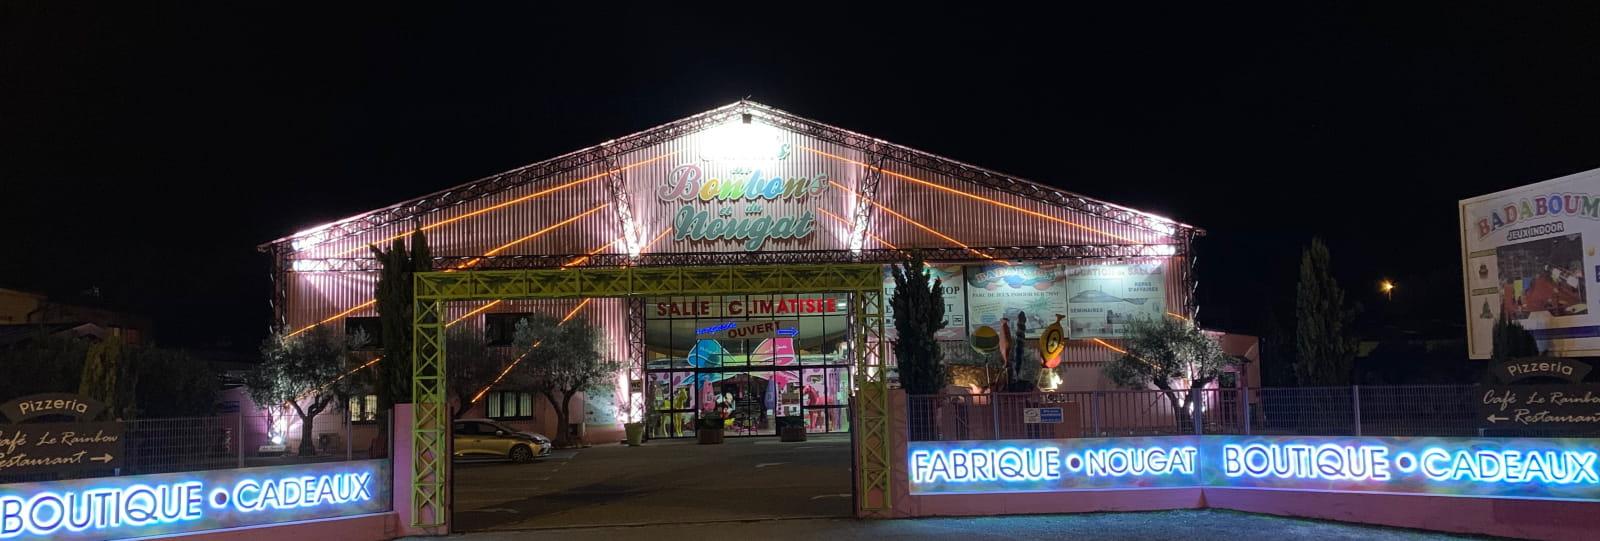 Candy and Nougat palace